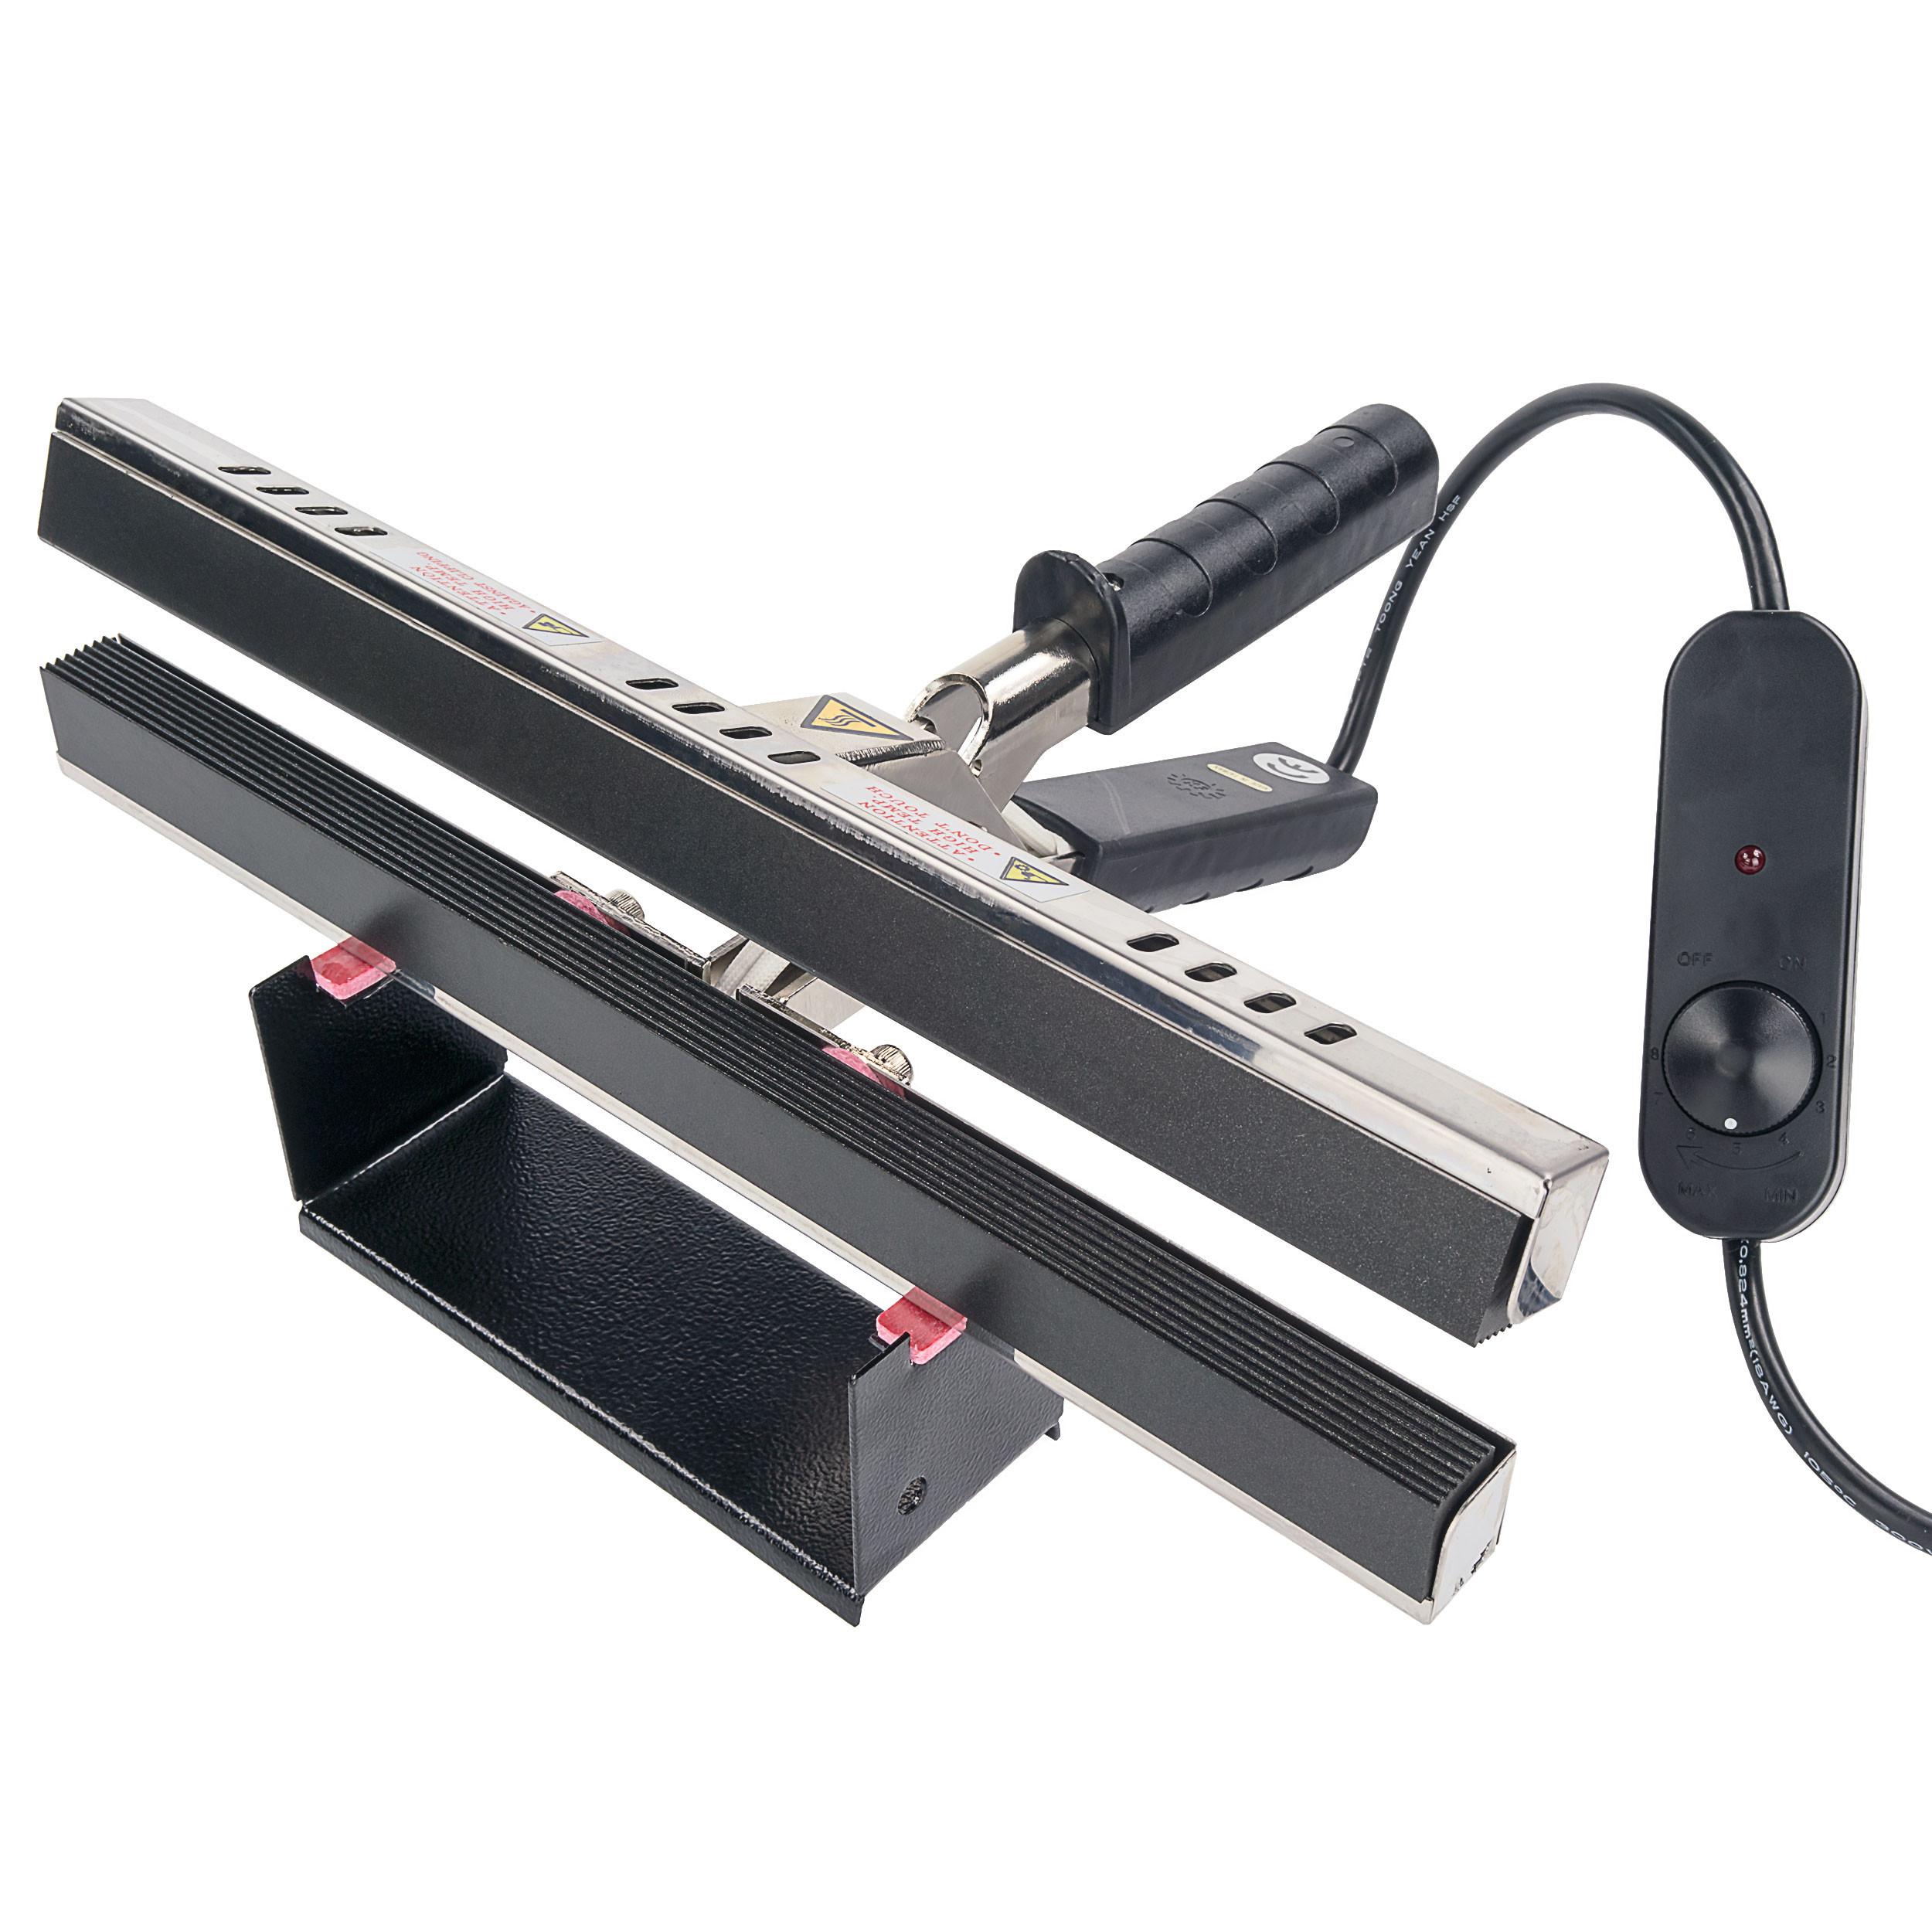 "12"" Portable Hand Crimper Sealer Constant Heat For Poly or Mylar / Foil Bags"